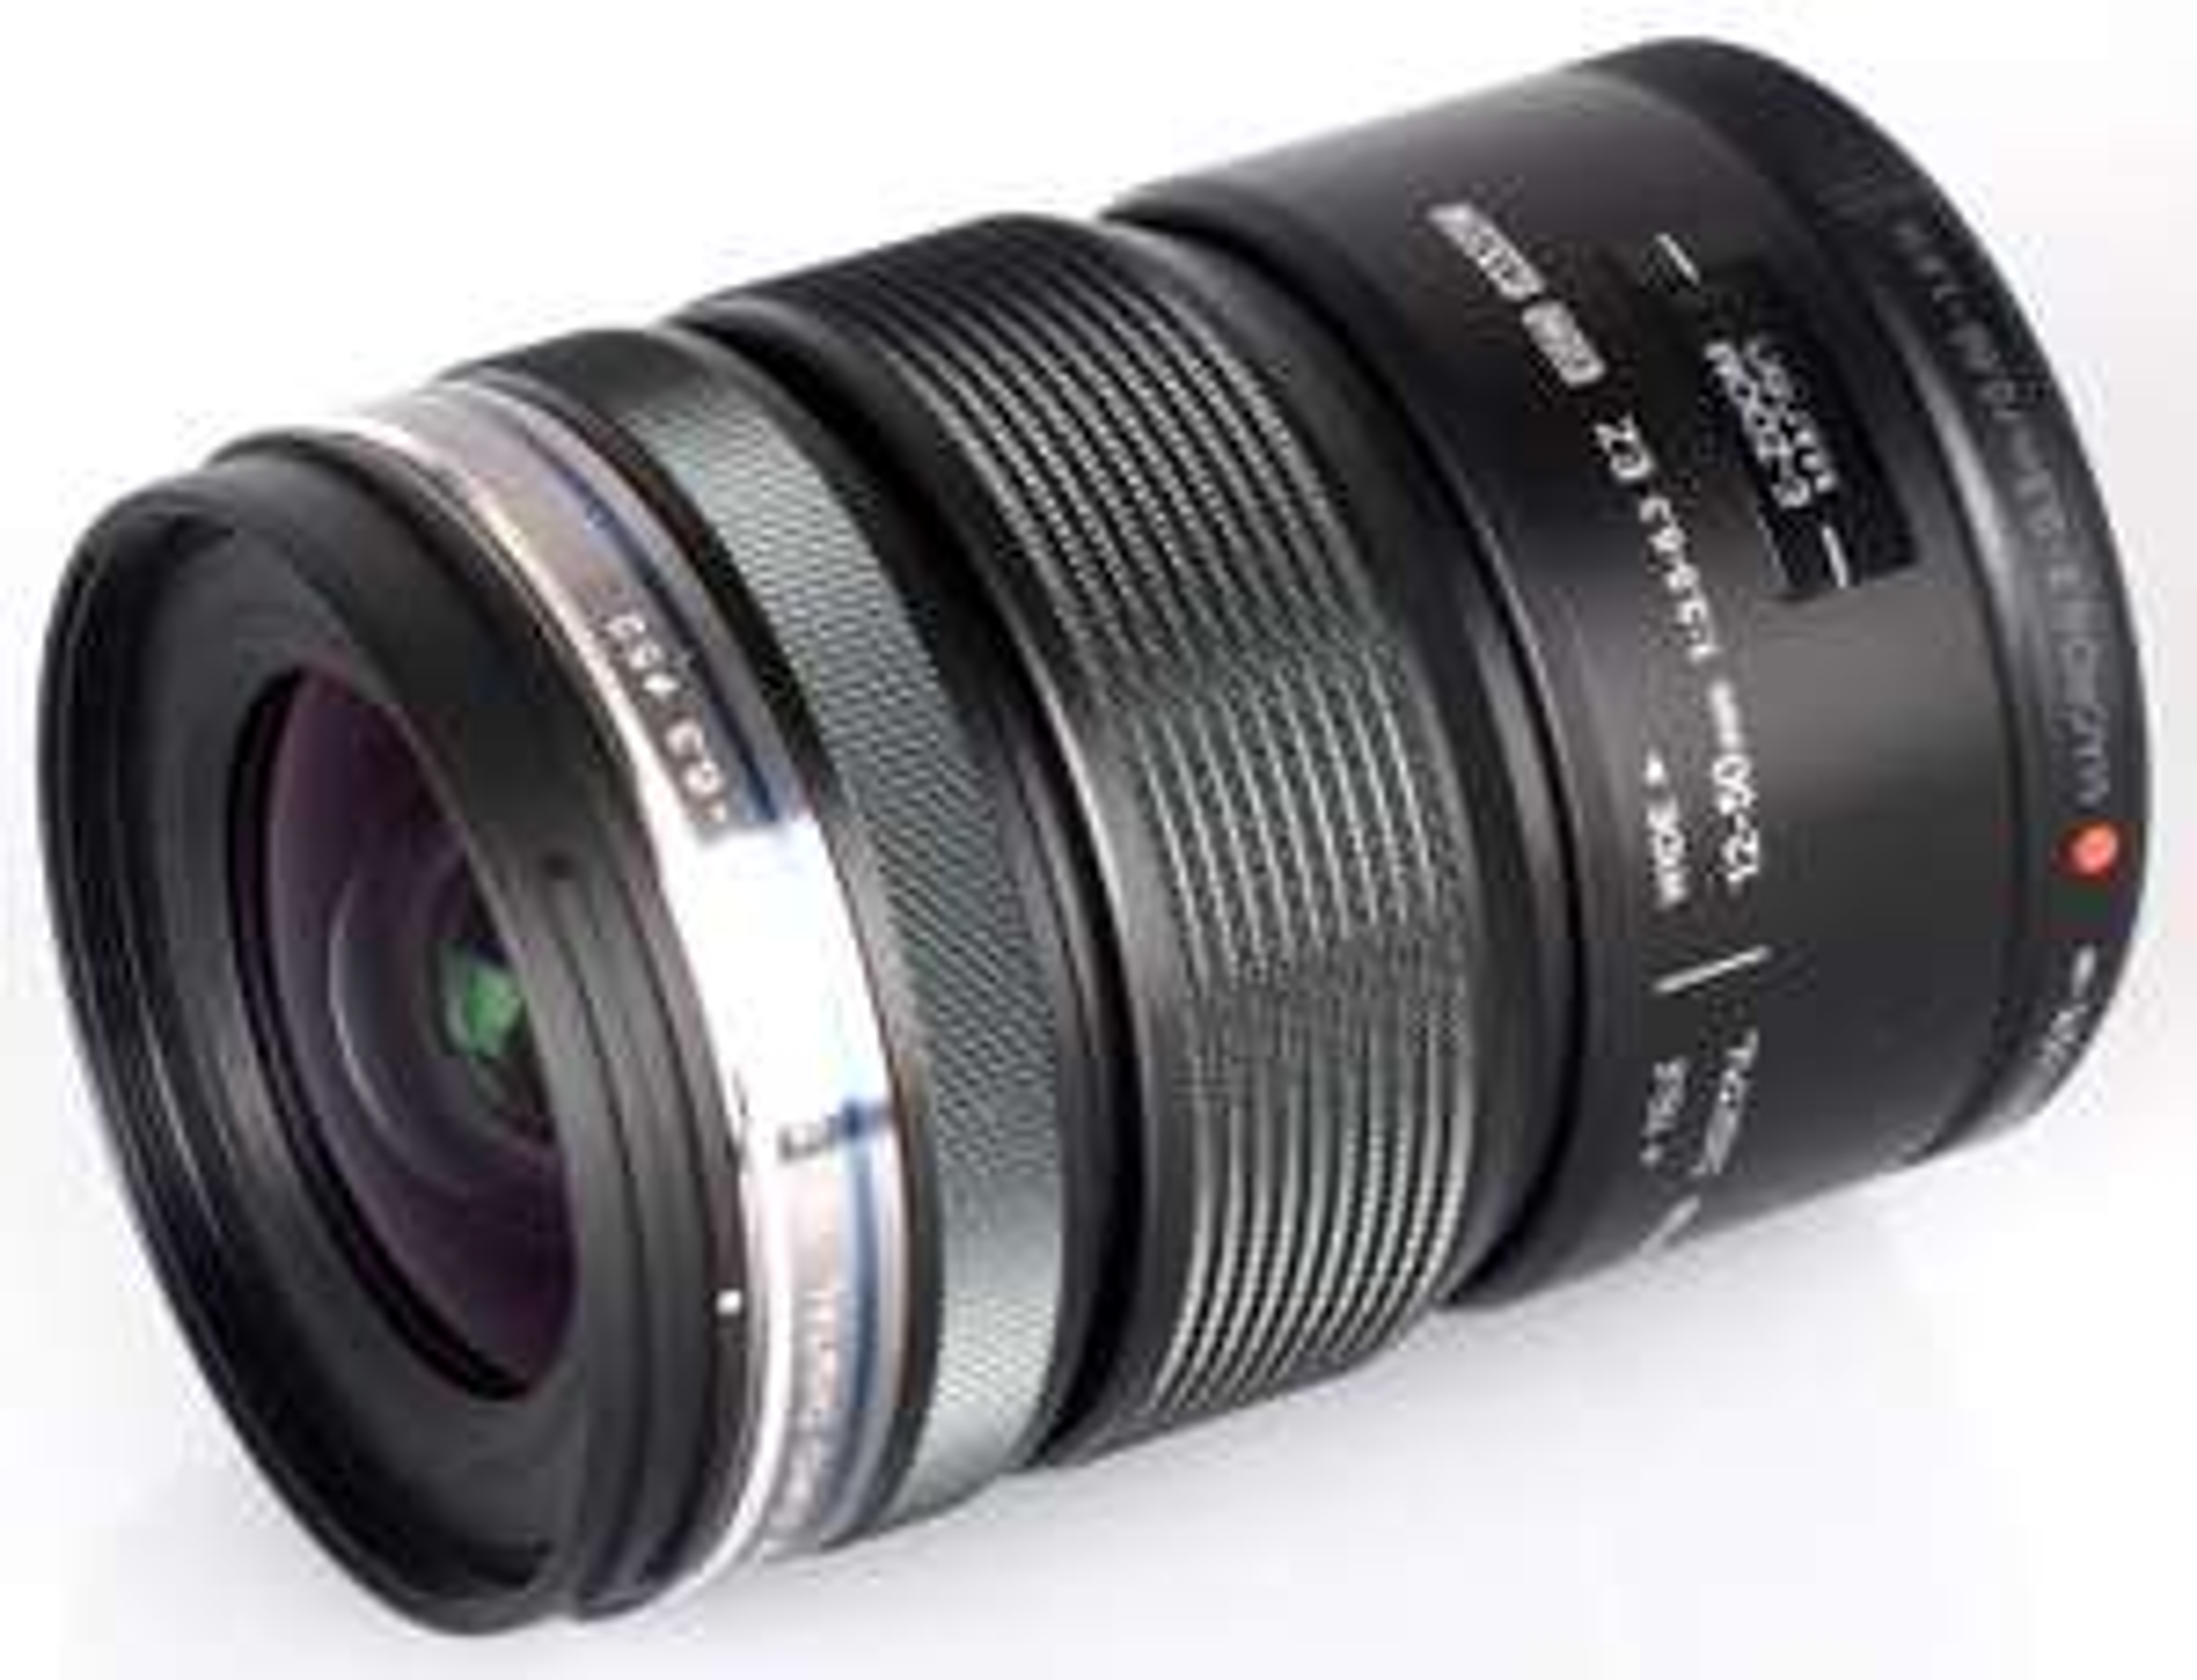 AMAZON.ES/Olympus M.Zuiko Digital ED 12-50mm inkl. Versand um 174 € statt 305 €